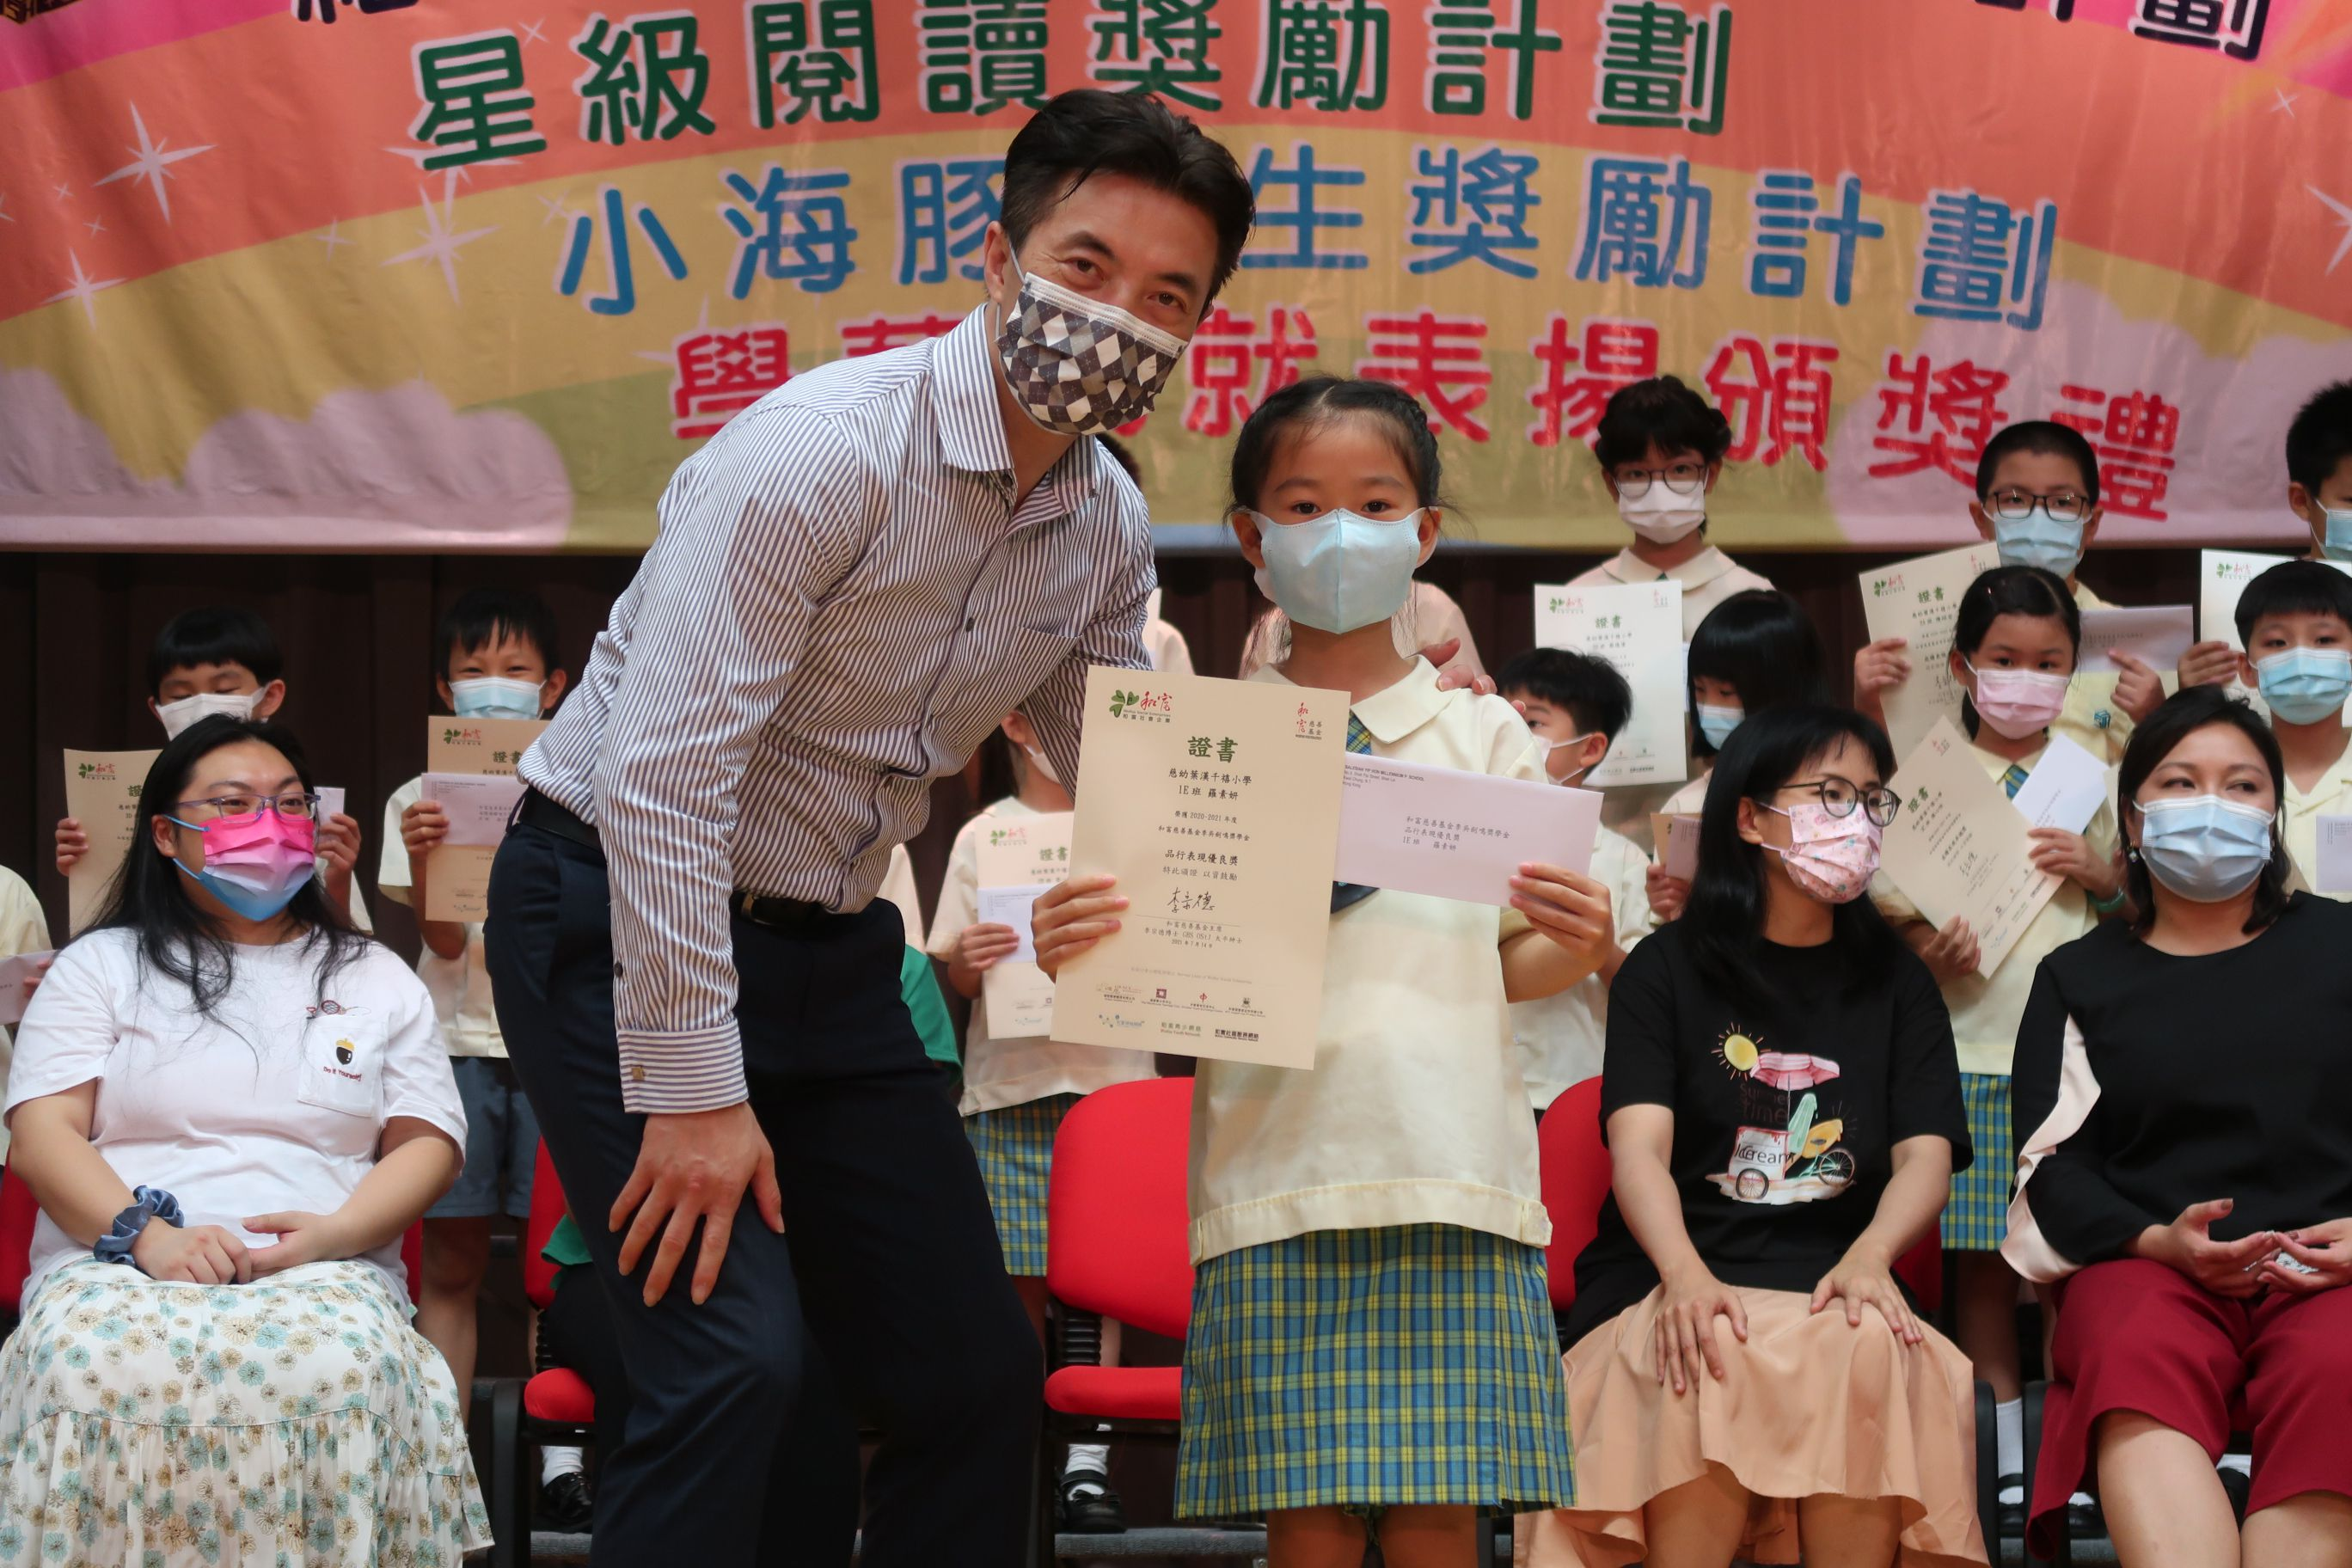 https://syh.edu.hk/sites/default/files/img_5952_1.jpg